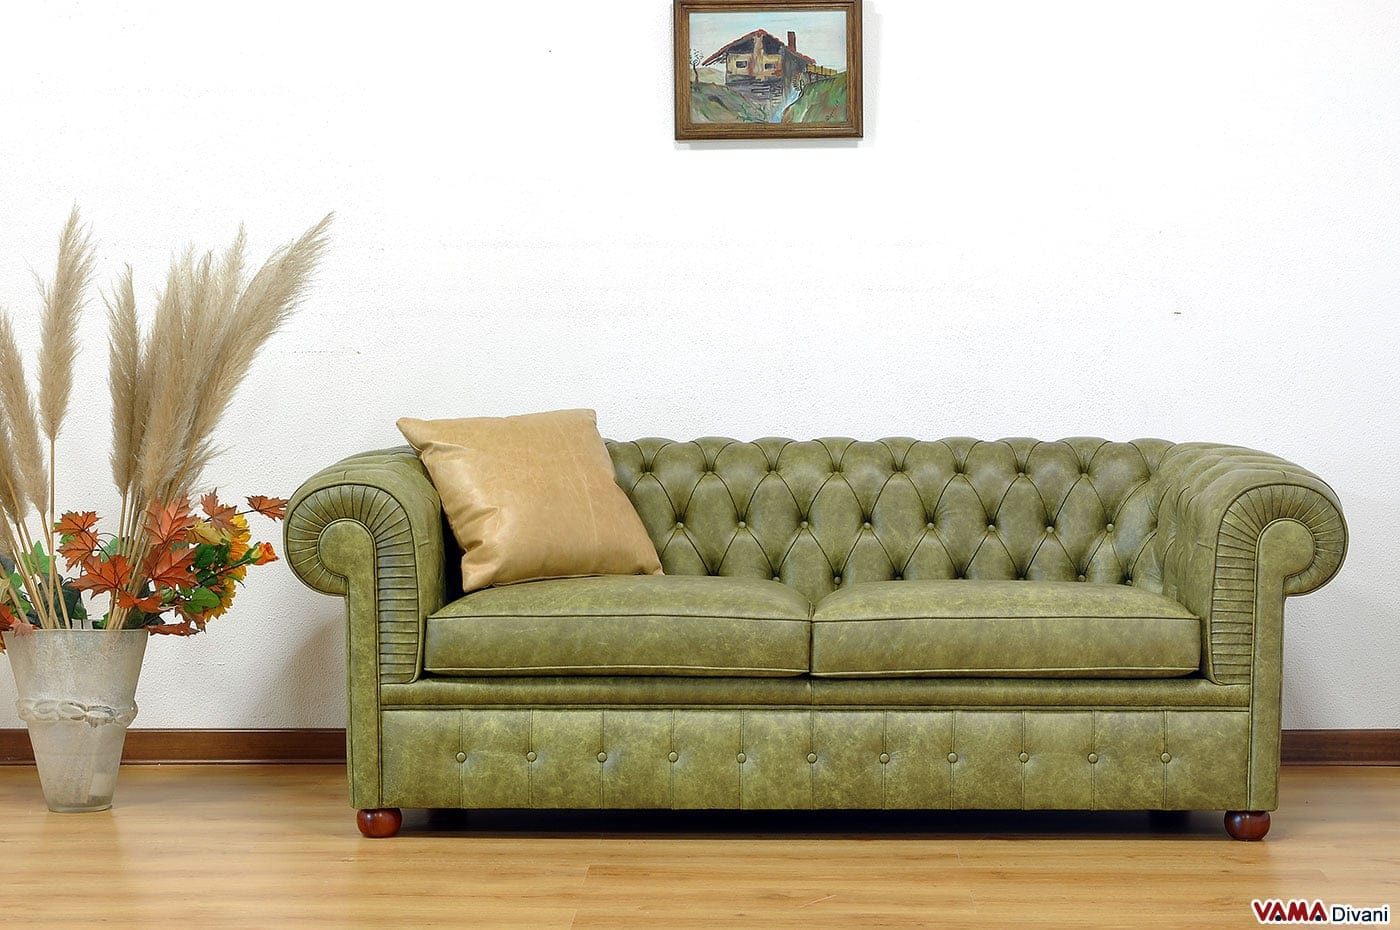 Divano Chesterfield 2 Posti Maxi Due Cuscini Large : divano chesterfield verde oliva vintage from www.vamadivani.it size 1400 x 930 jpeg 251kB